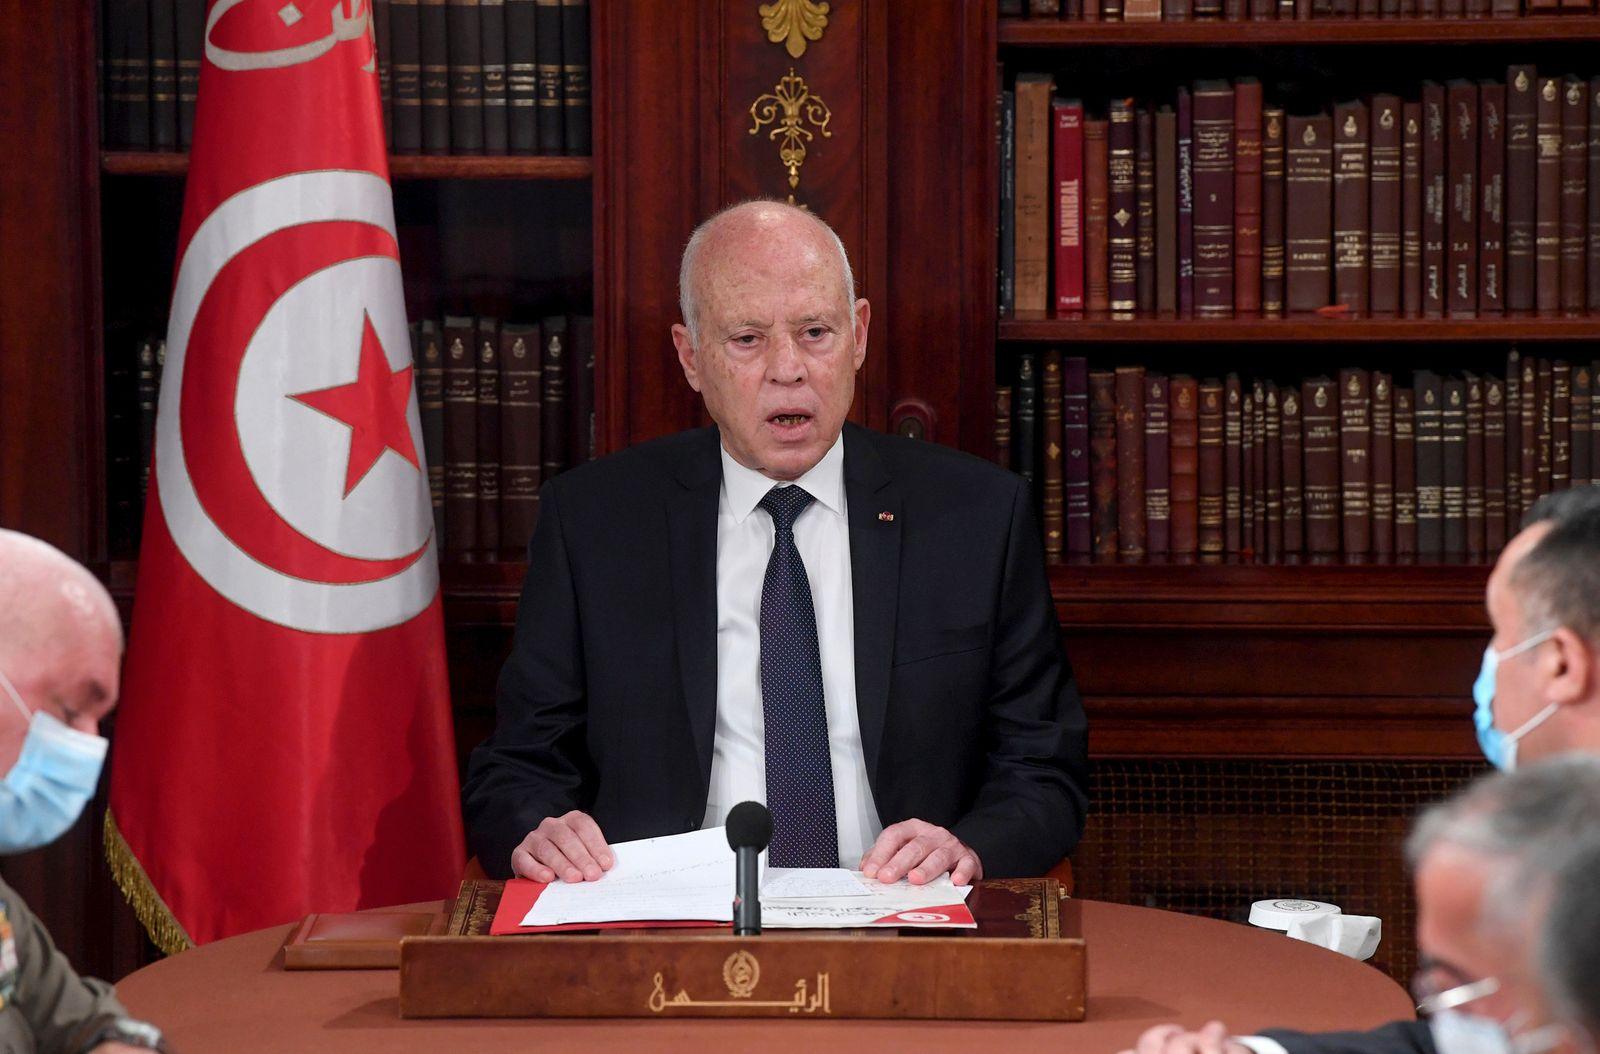 CORRECTION Tunisa Protests